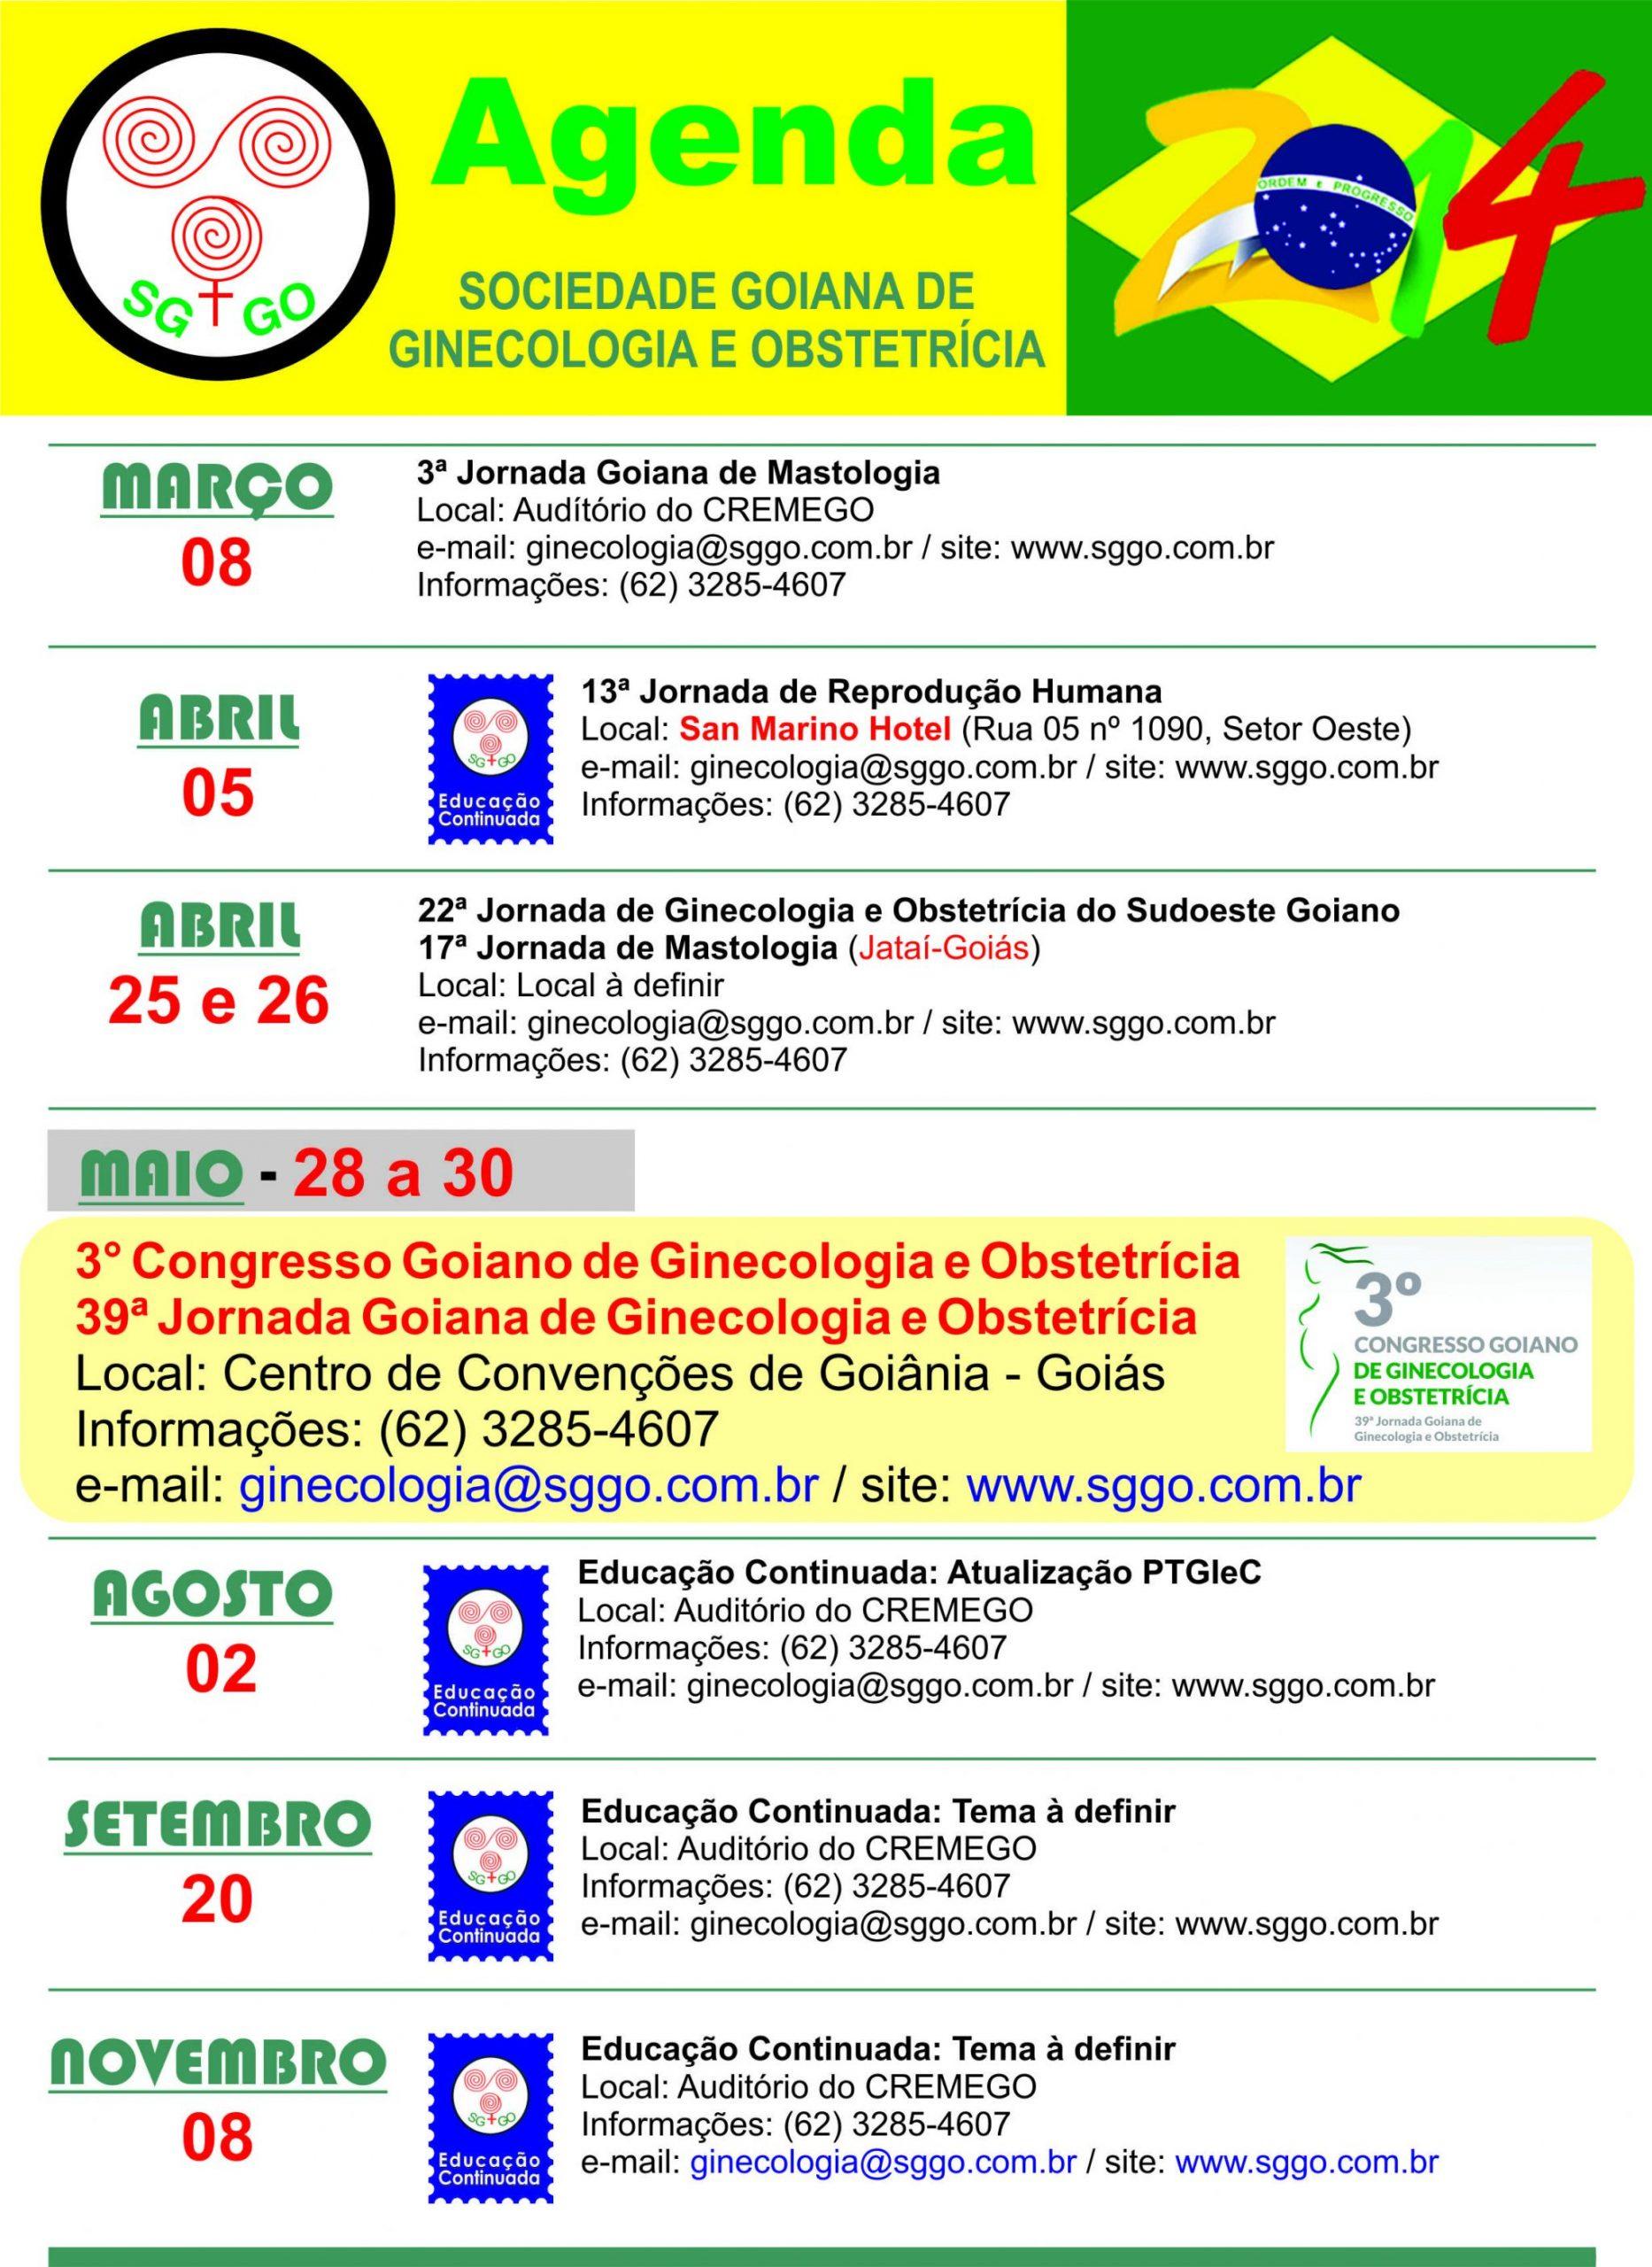 Agenda_SGGO_2014(3)